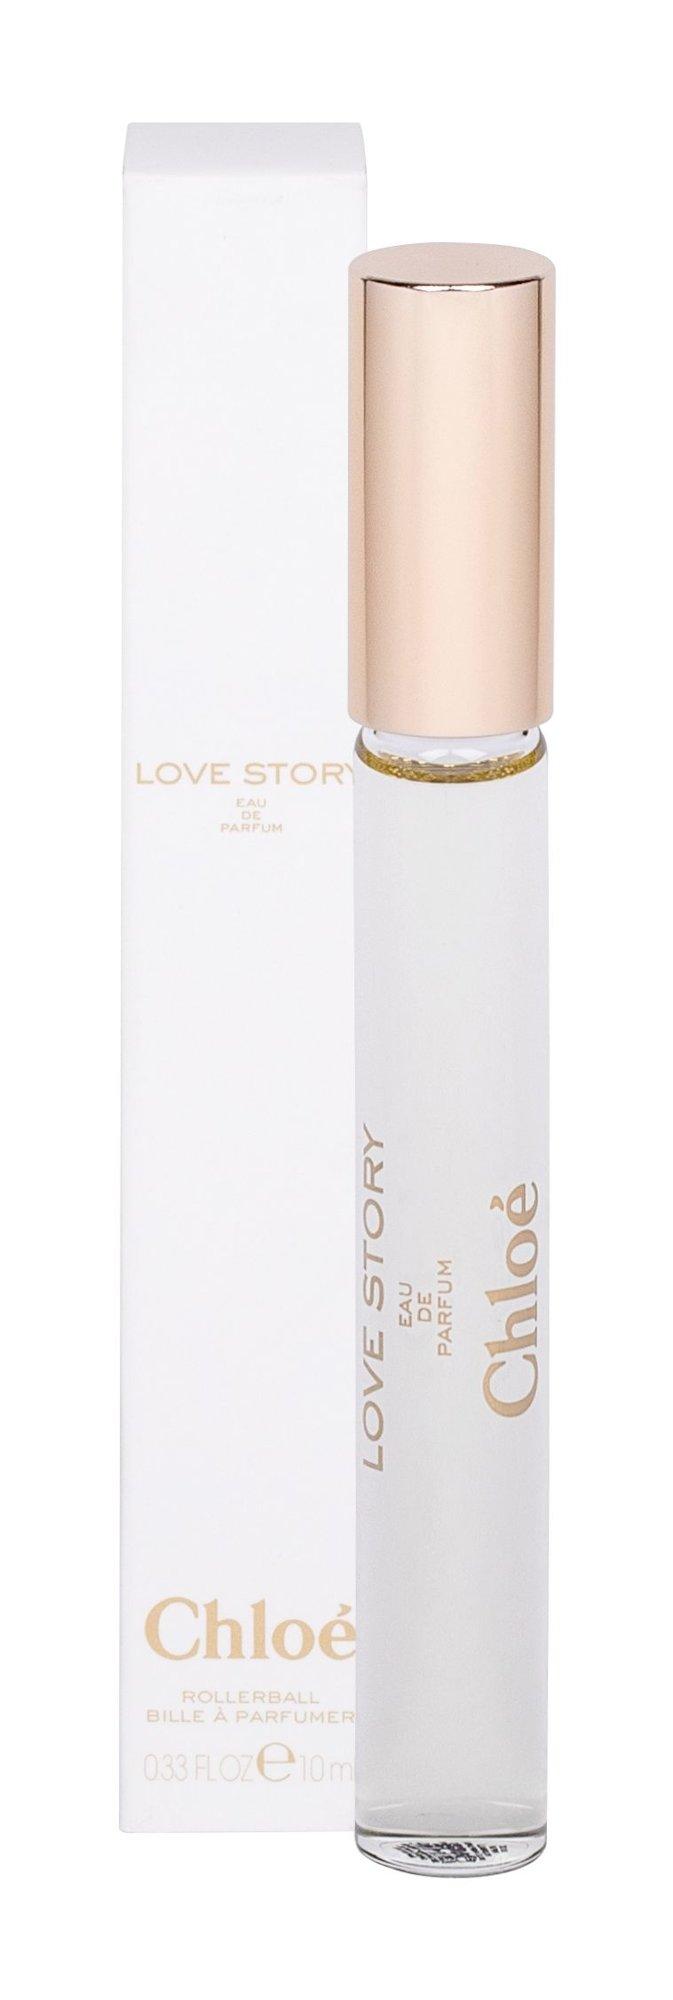 Chloe Love Story Eau de Parfum 10ml